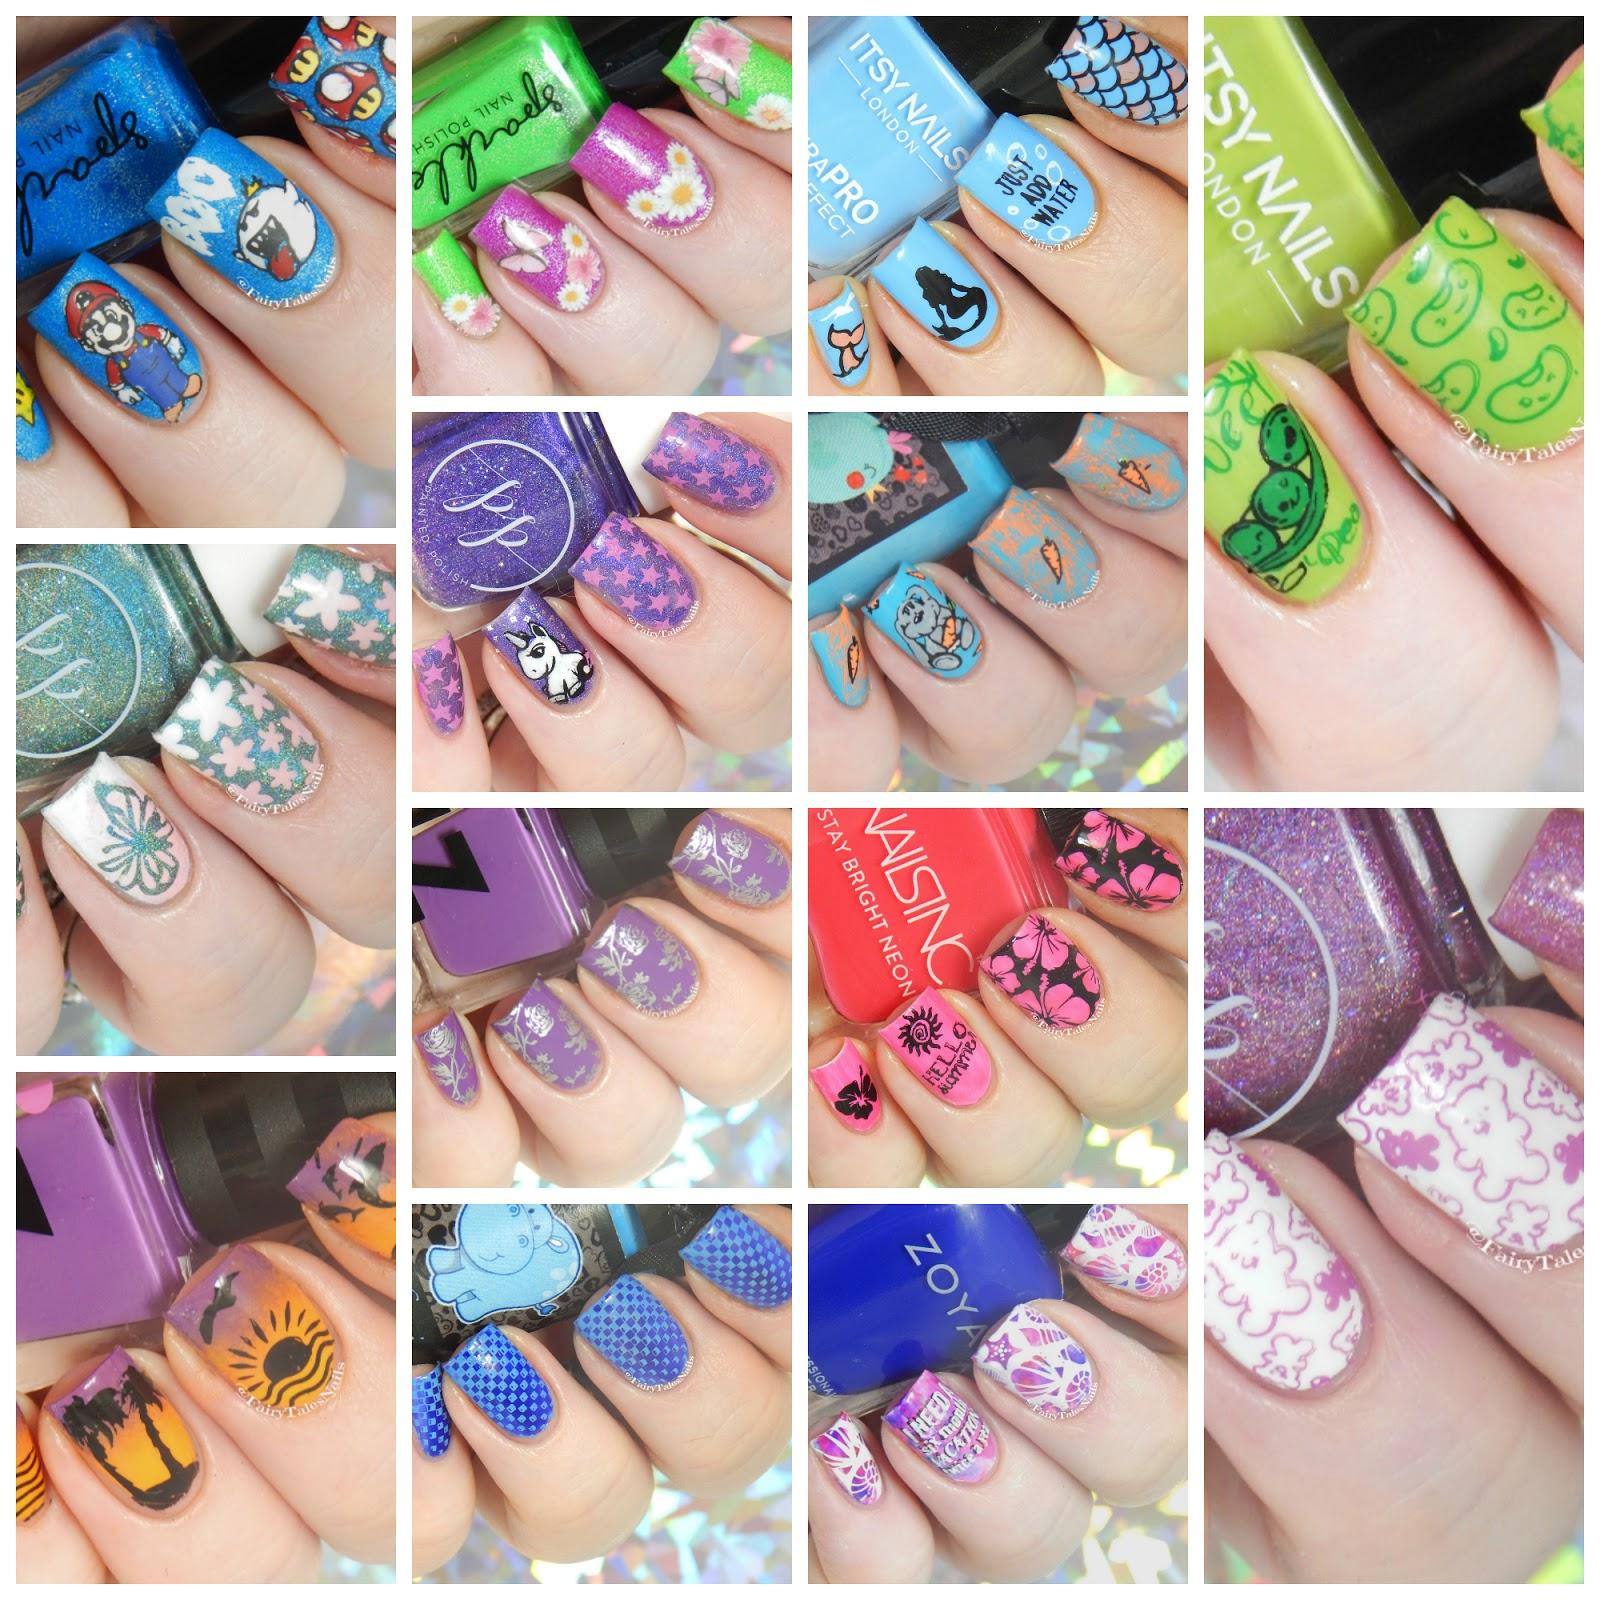 FairyTales Nails: June 2017 Nail Art Round-Up